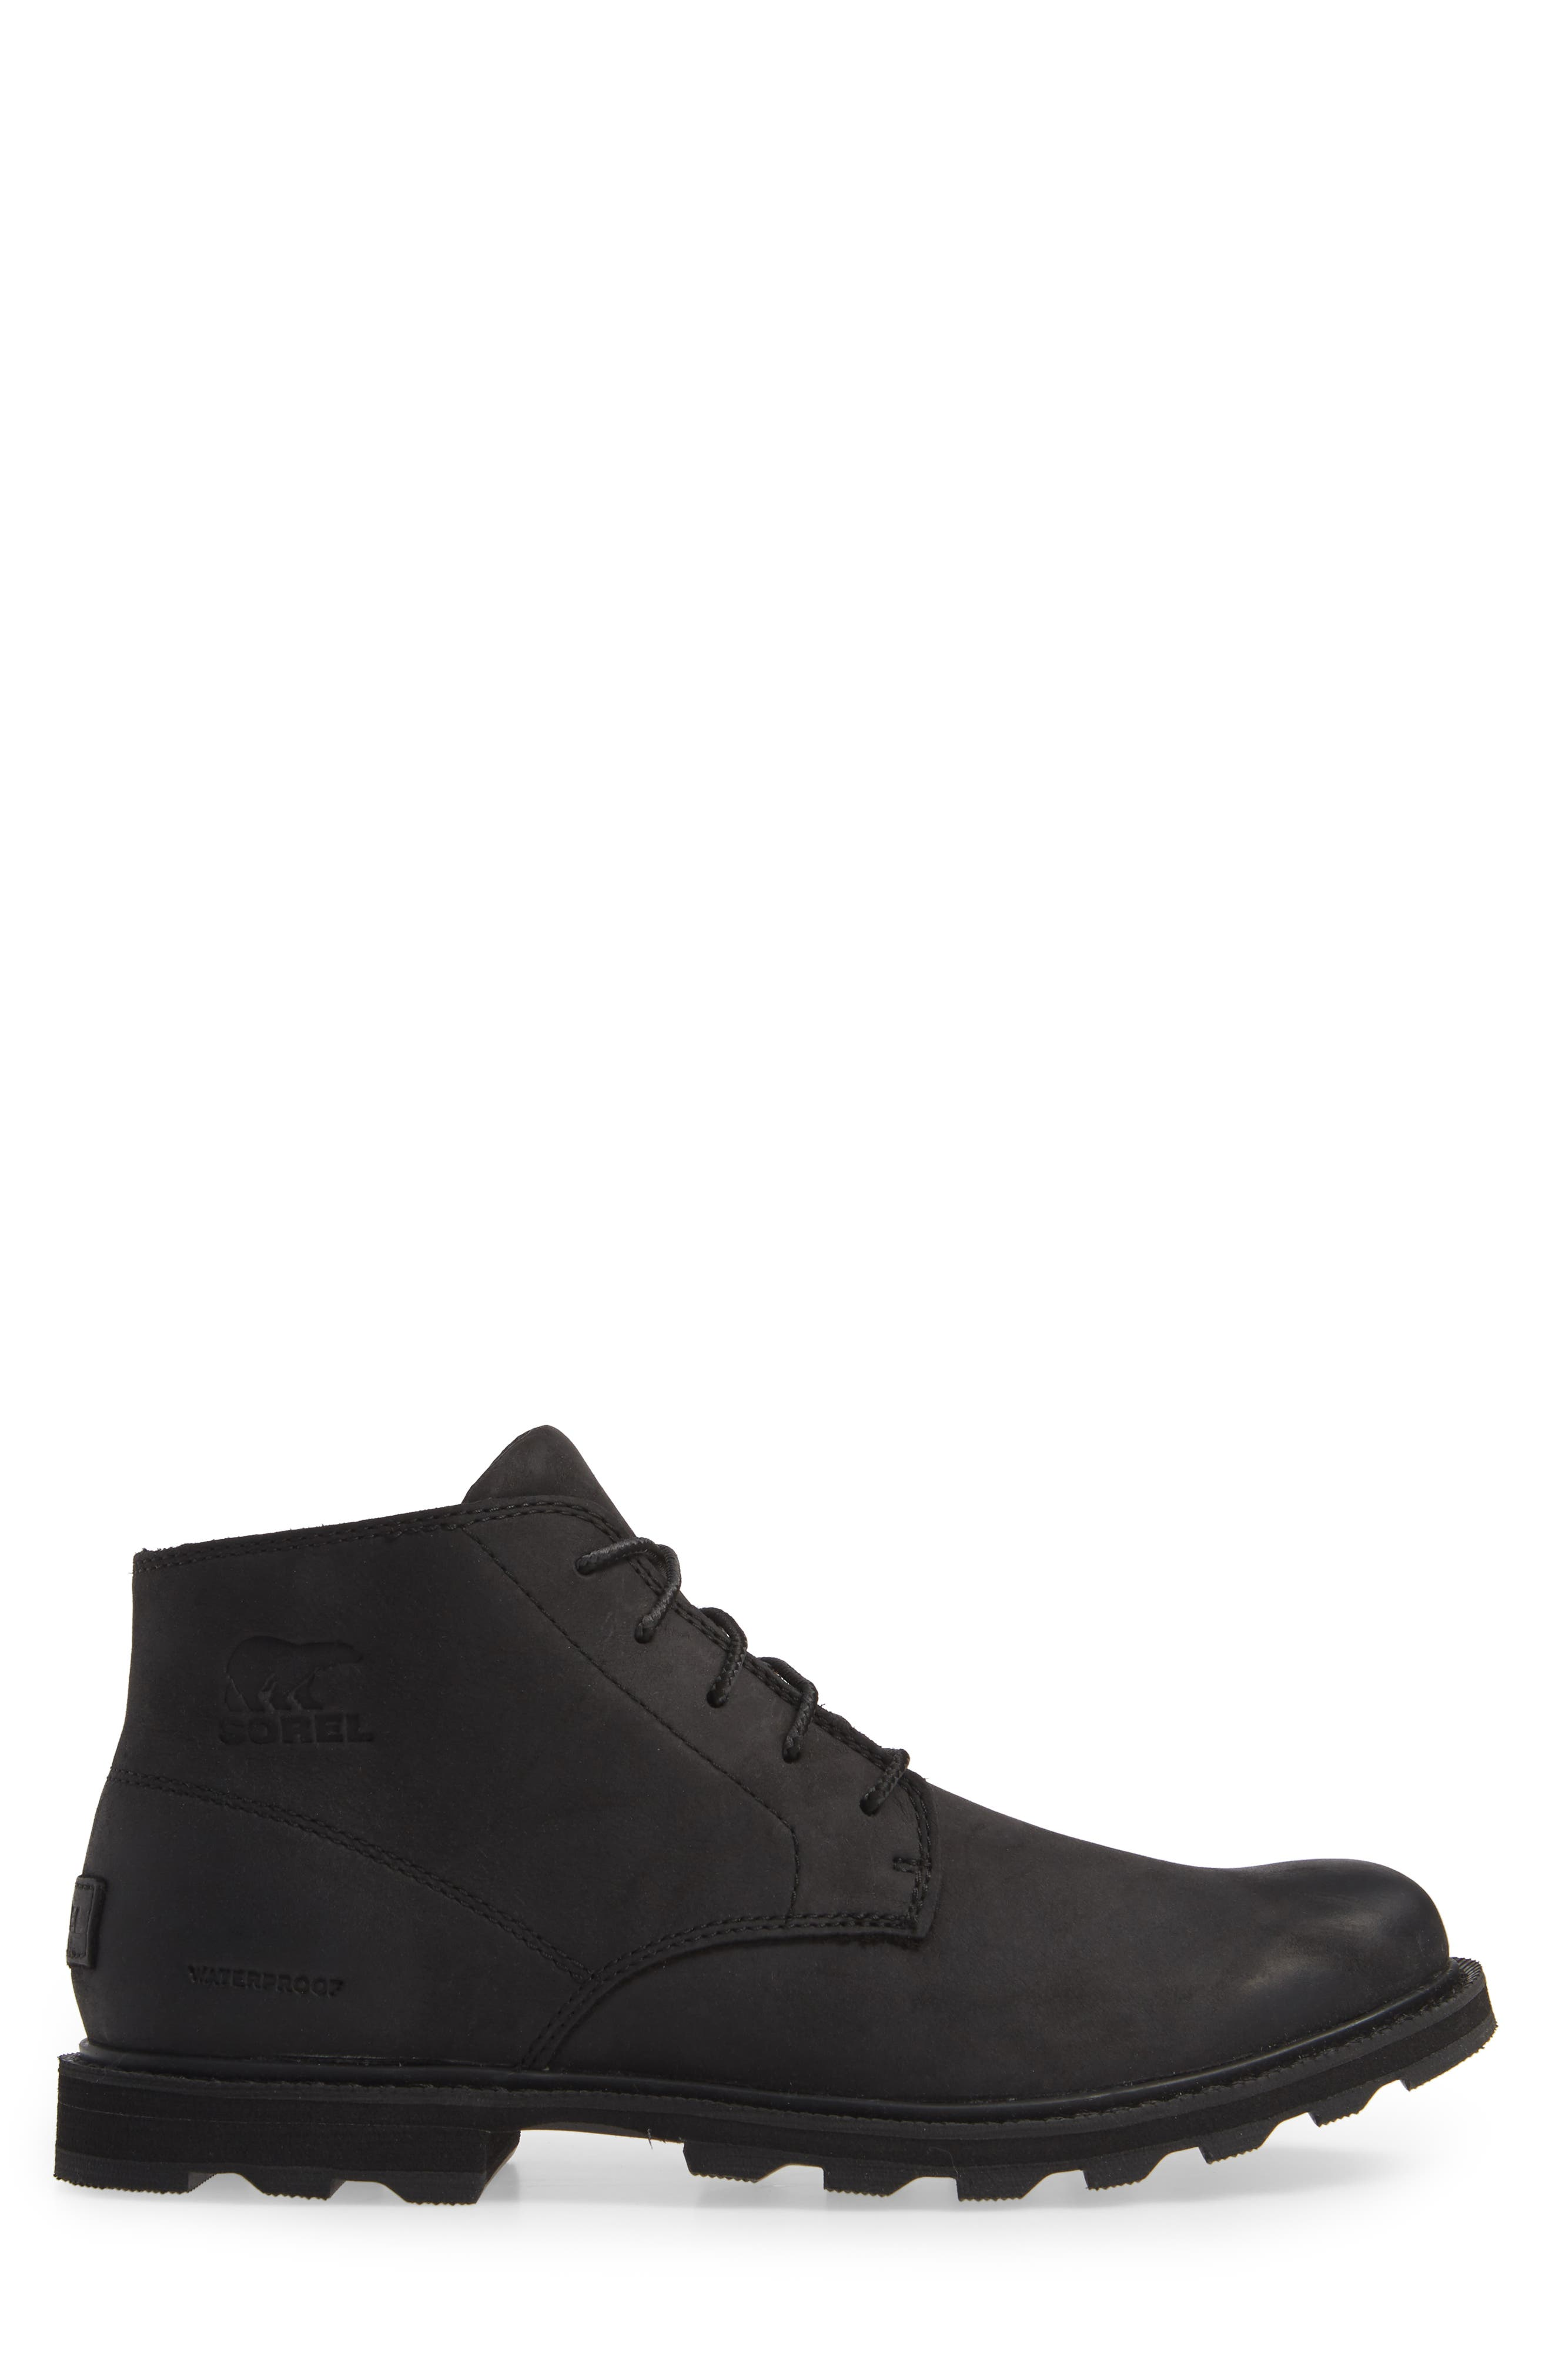 Madson Waterproof Boot,                             Alternate thumbnail 3, color,                             BLACK/ BLACK